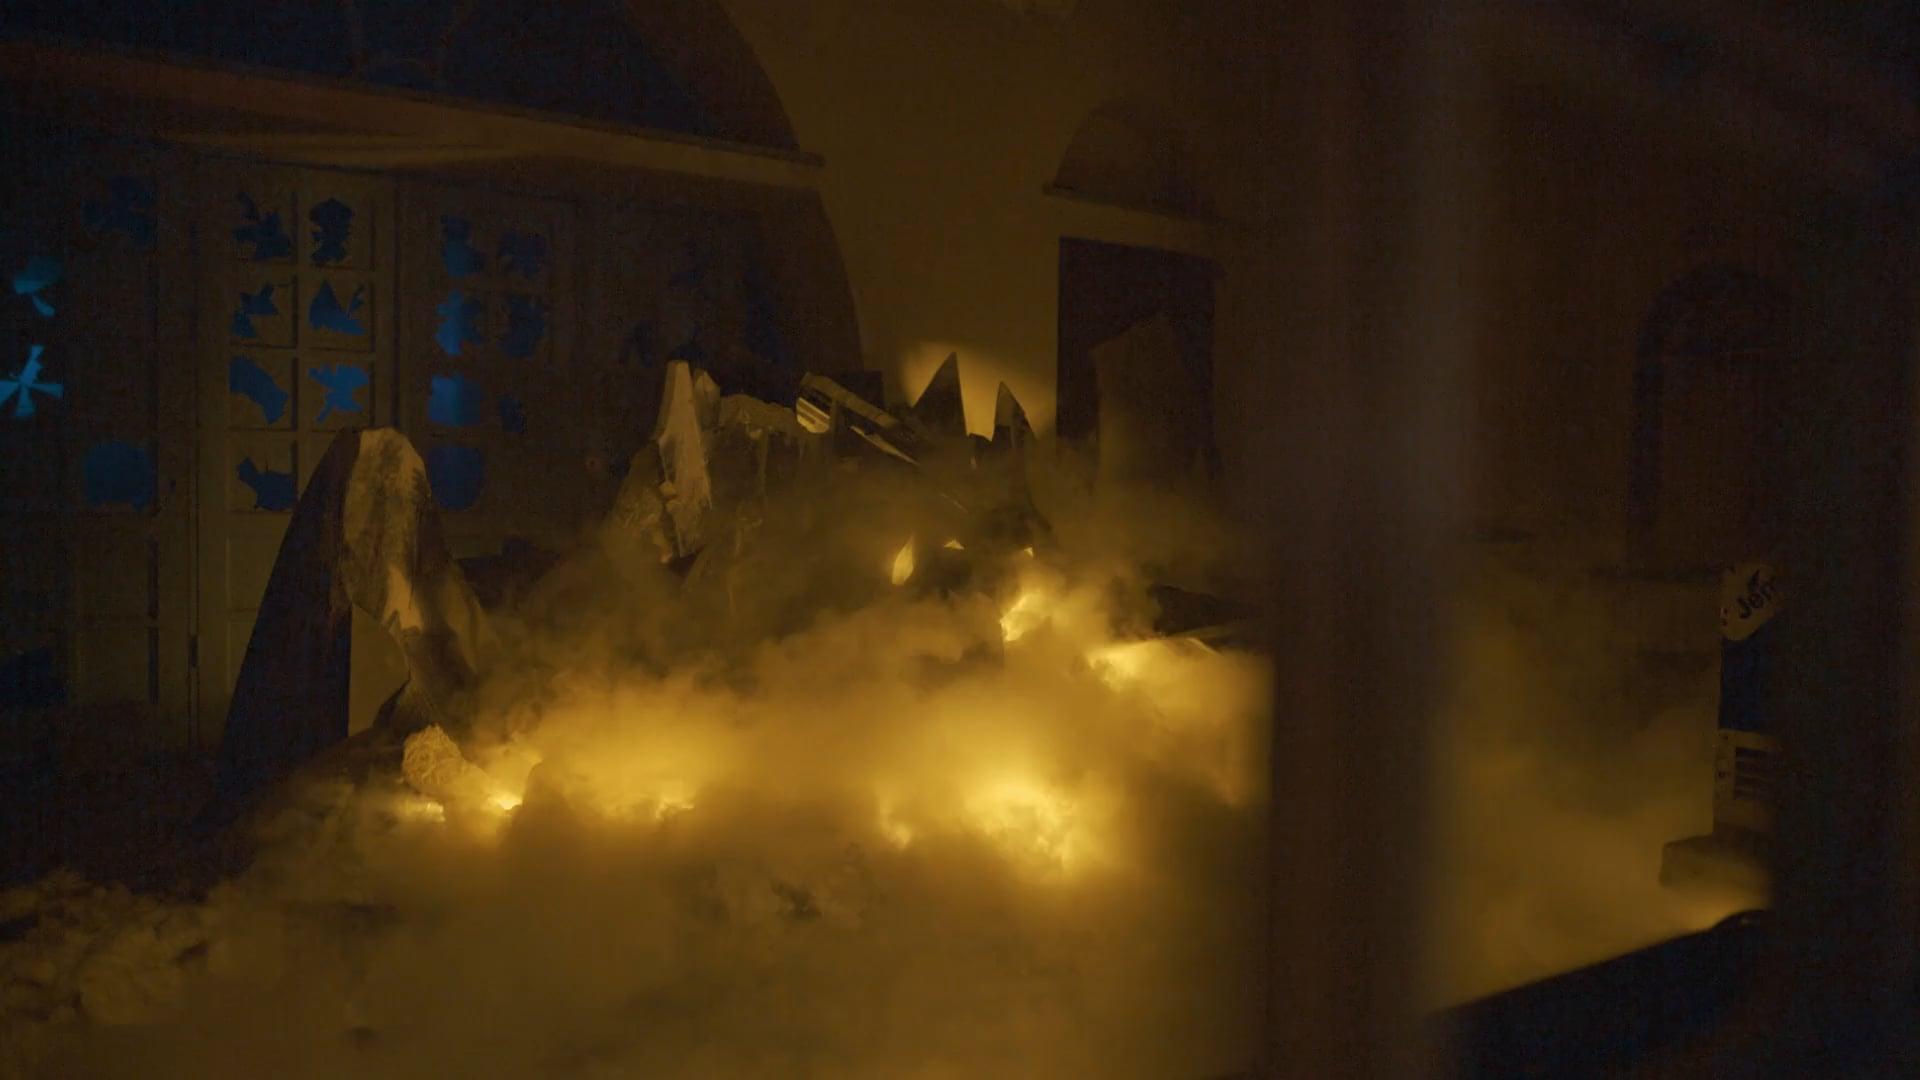 Deus Ex Machina by Elinor Sahm and 18 Degrees